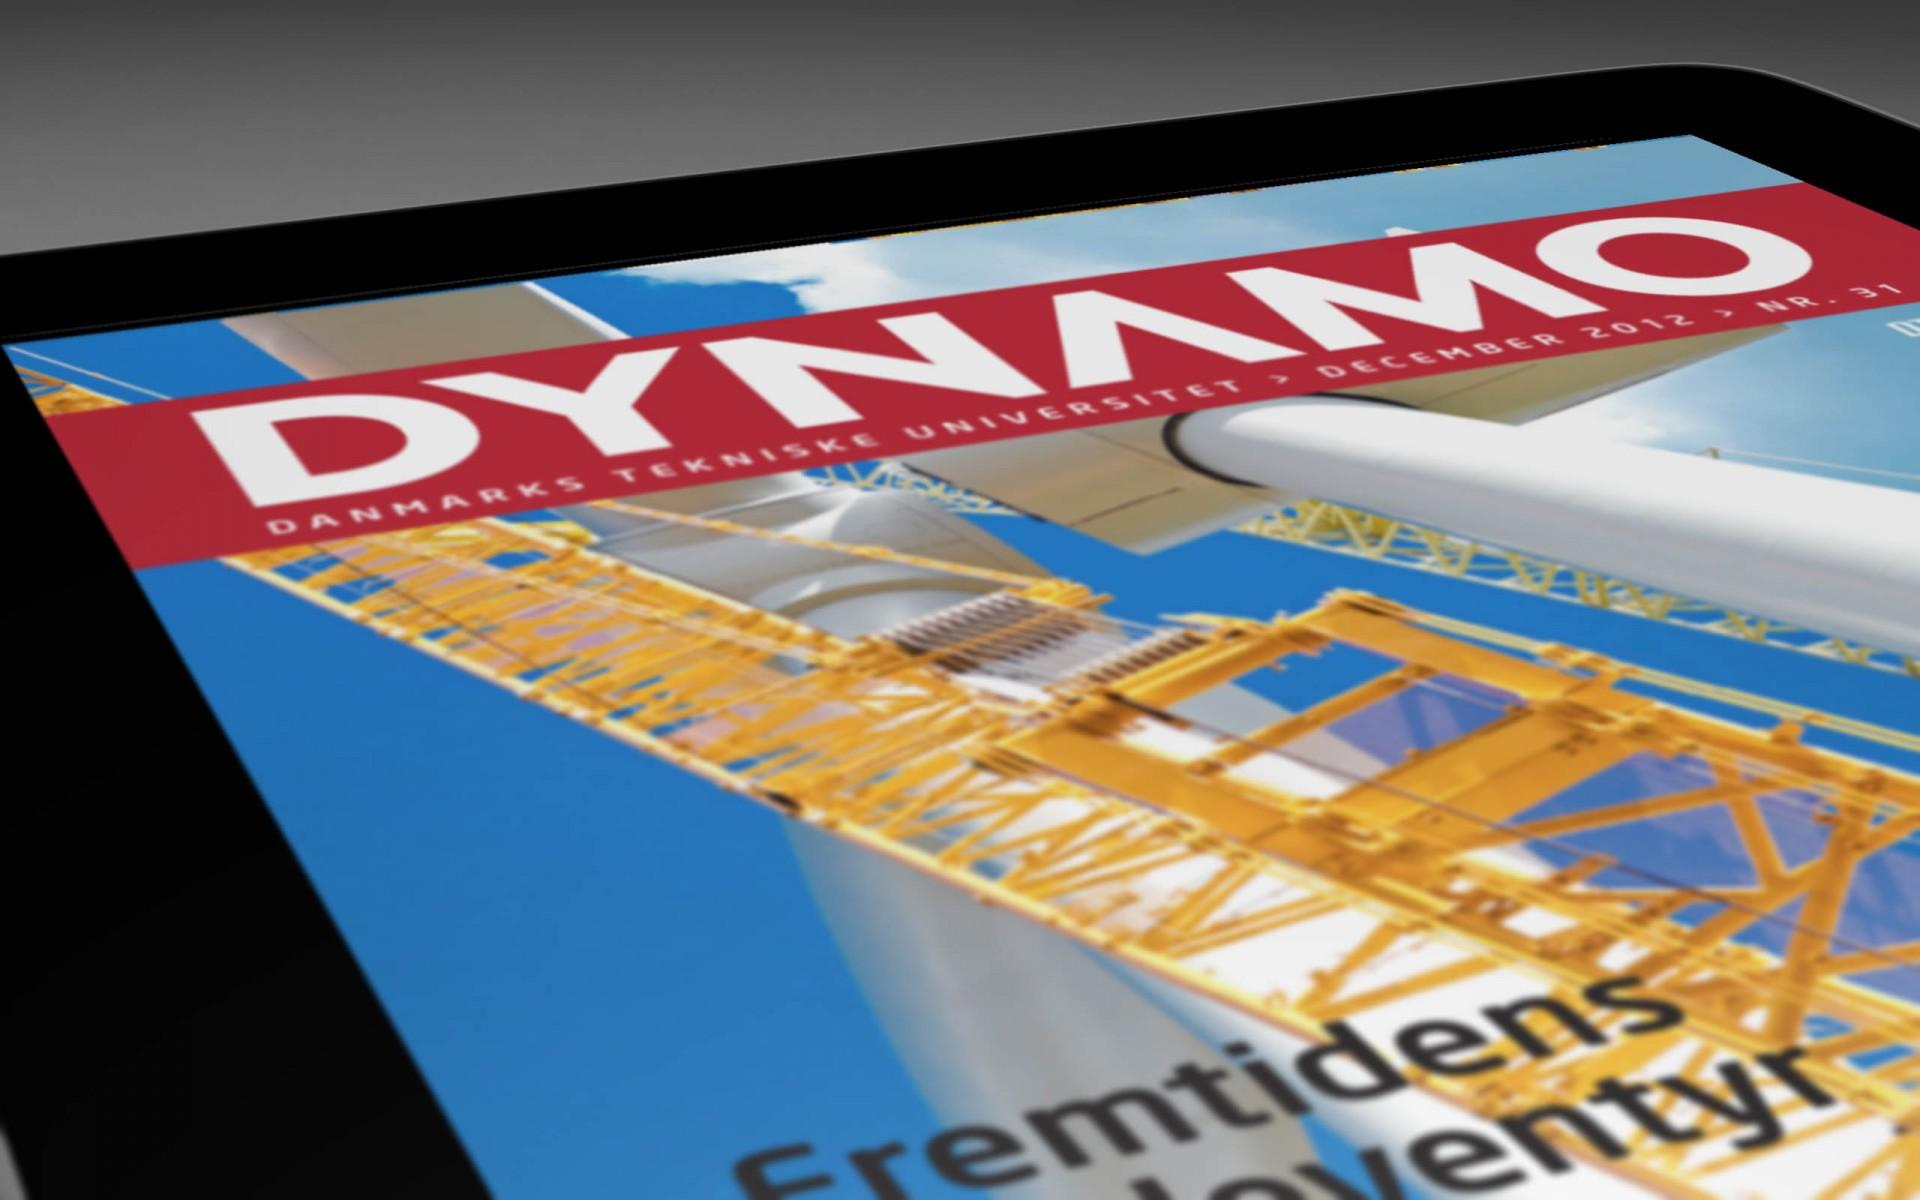 iPad magazine Dynamo